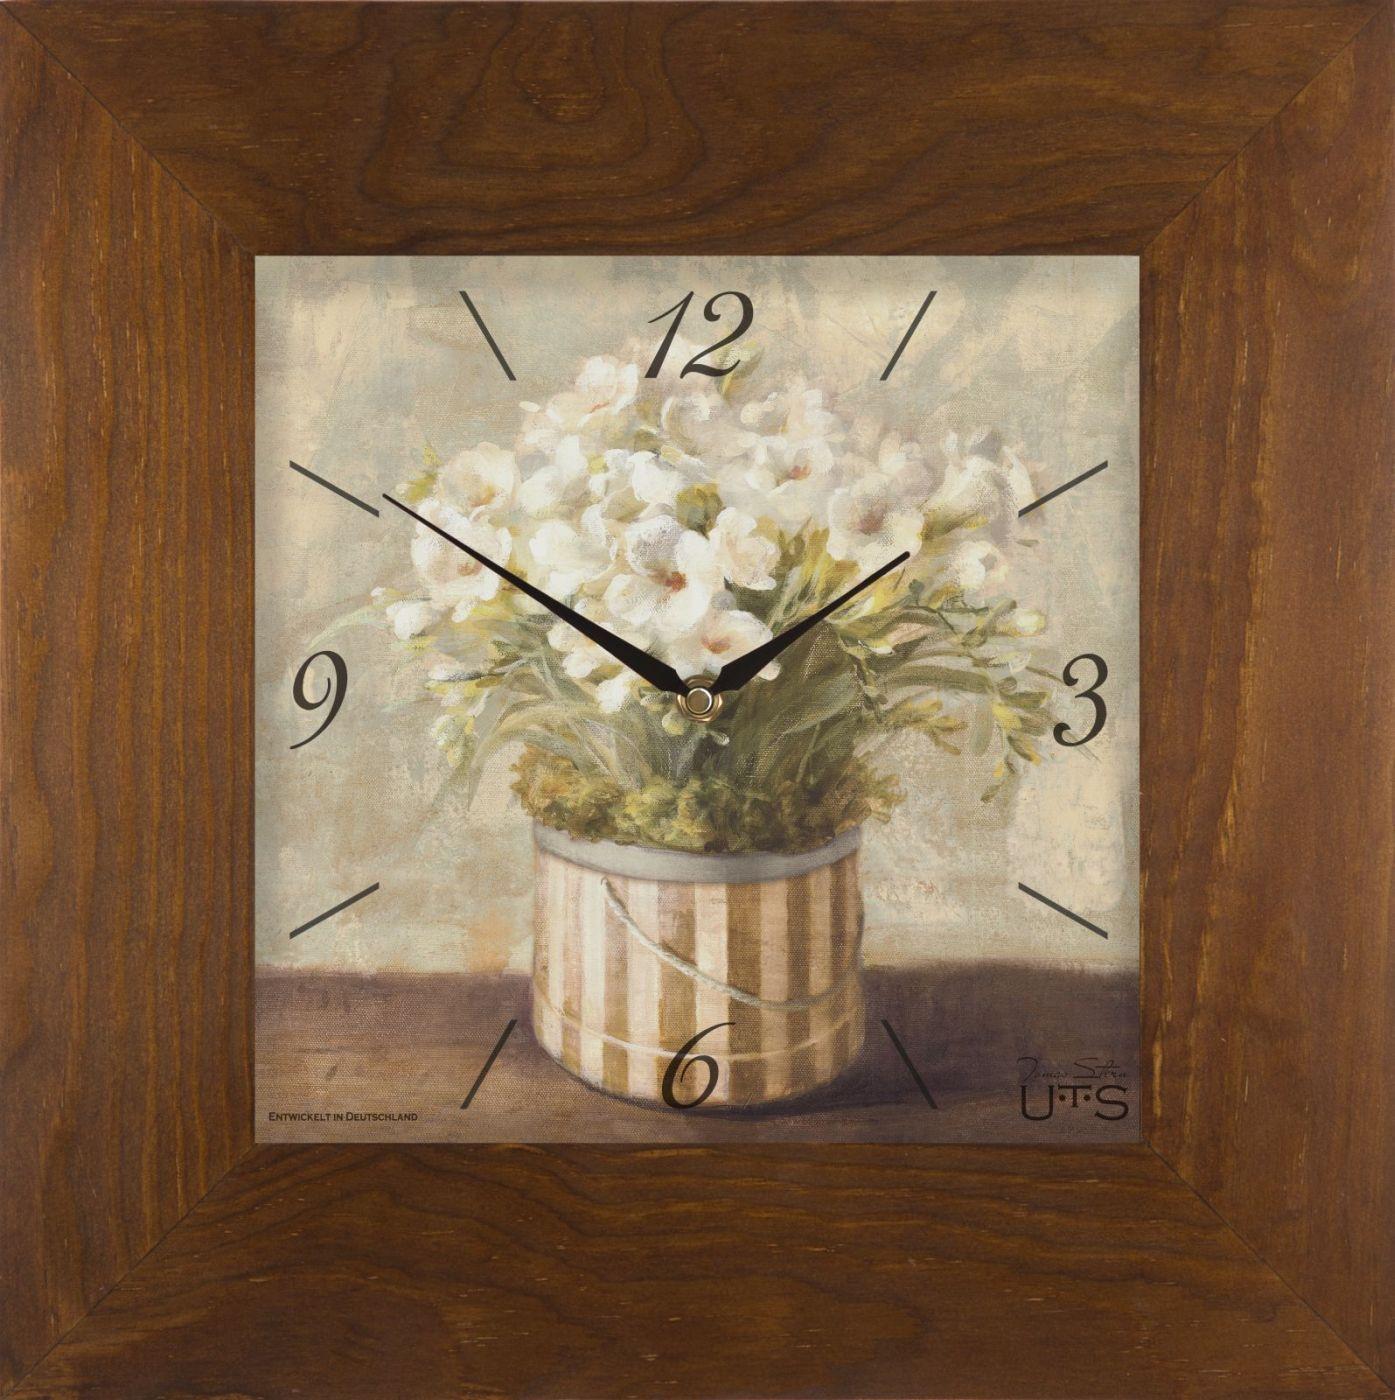 Часы настенные Часы настенные Tomas Stern 7002B chasy-nastennye-tomas-stern-7002b-germaniya-tayvan.jpg